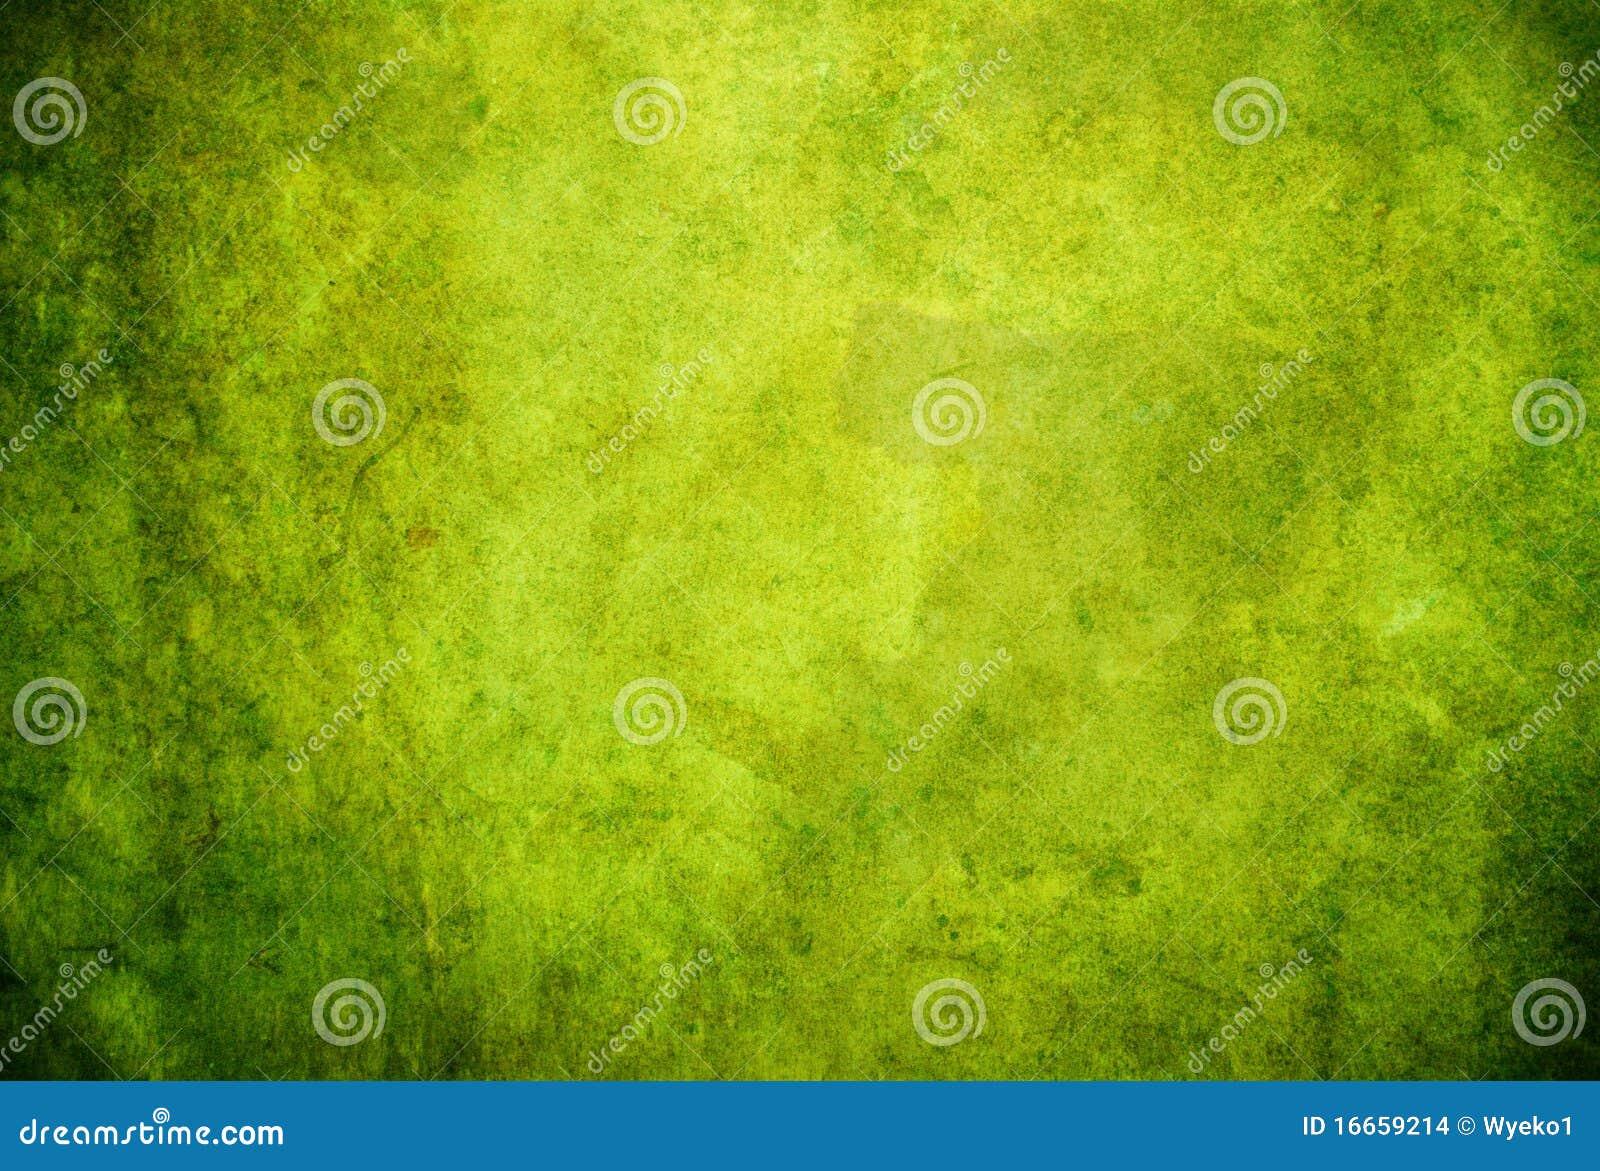 green grunge texture thumb - photo #7